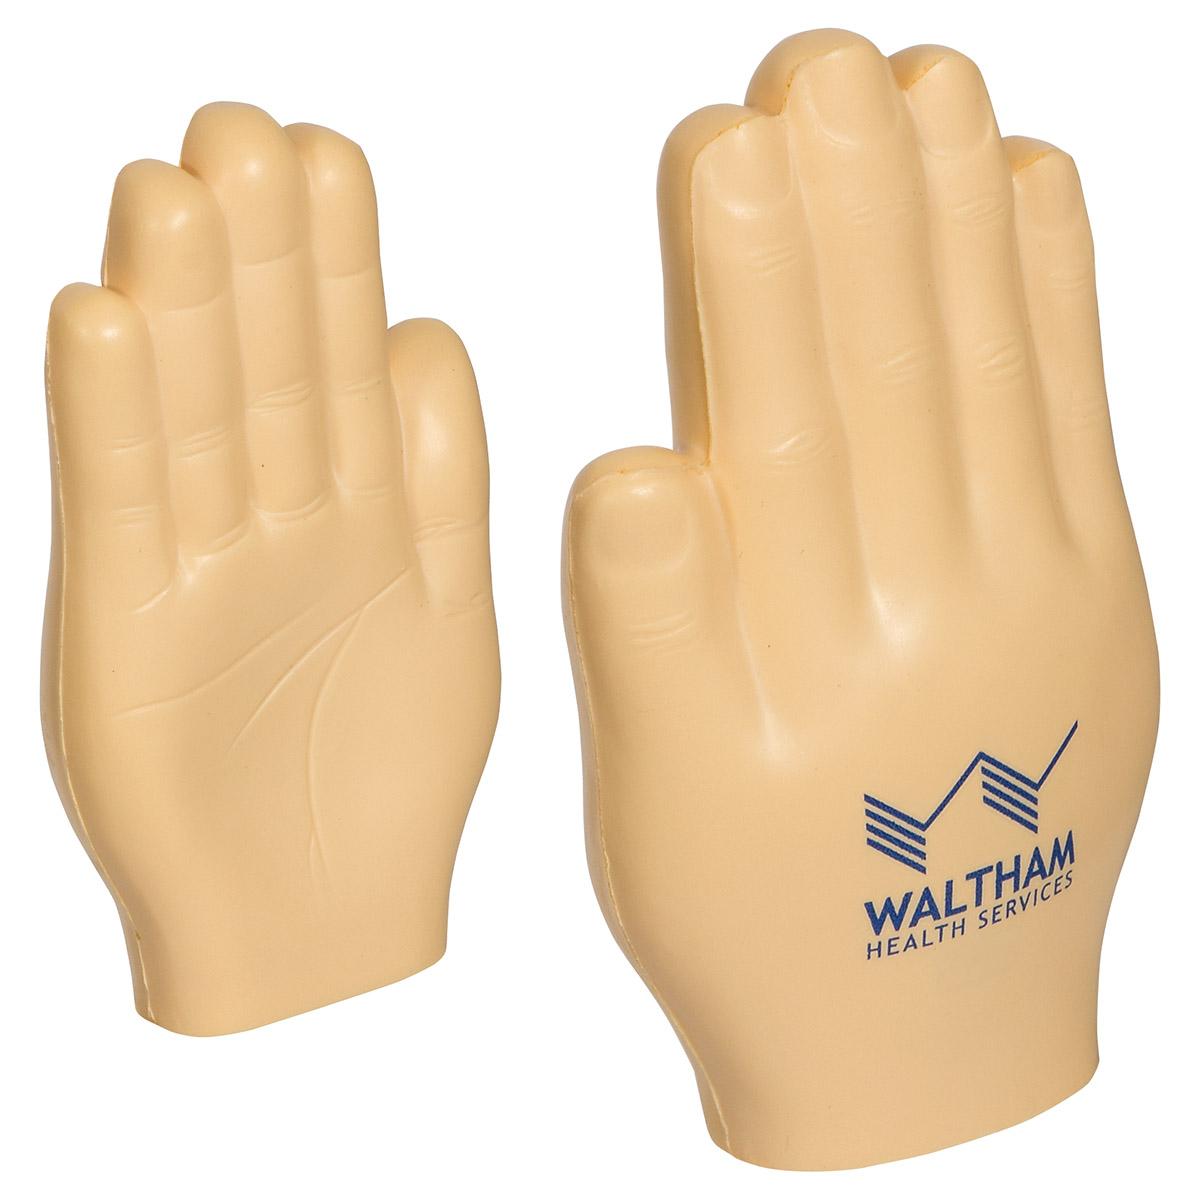 Hand Stress Reliever, LAN-HF24, 1 Colour Imprint